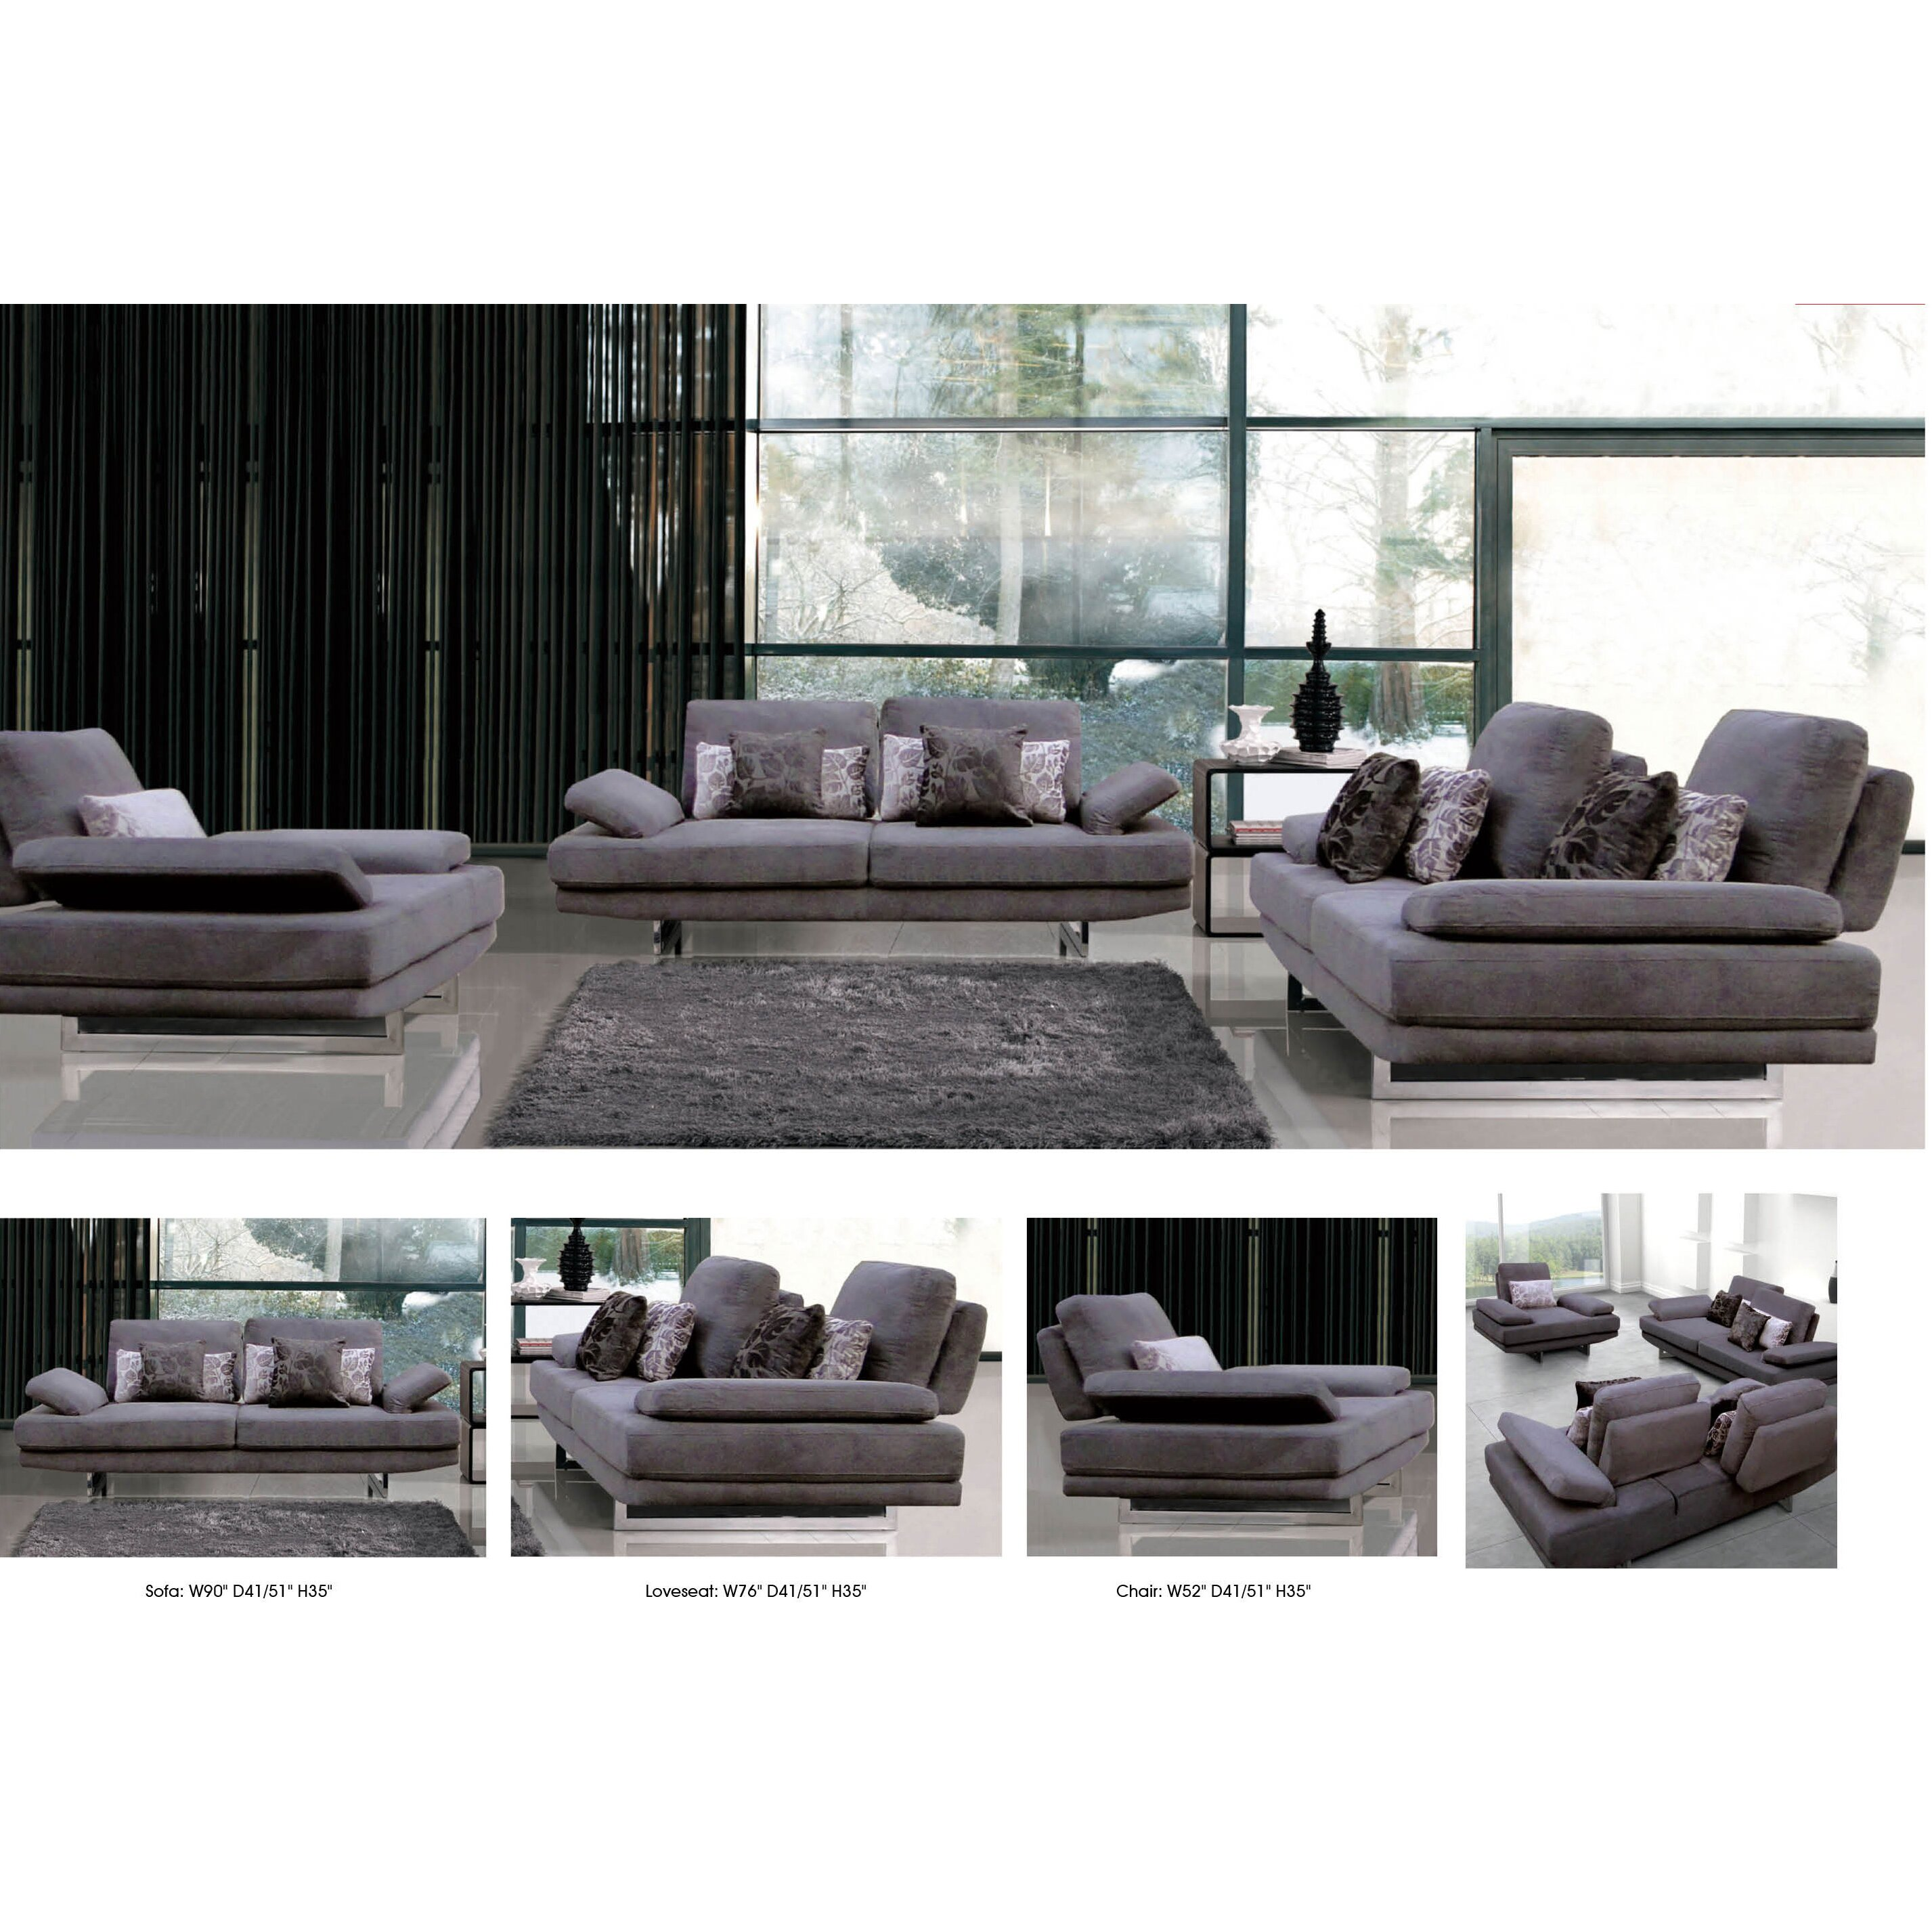 Nocidesign 3 piece living room set wayfair for 3 piece living room set